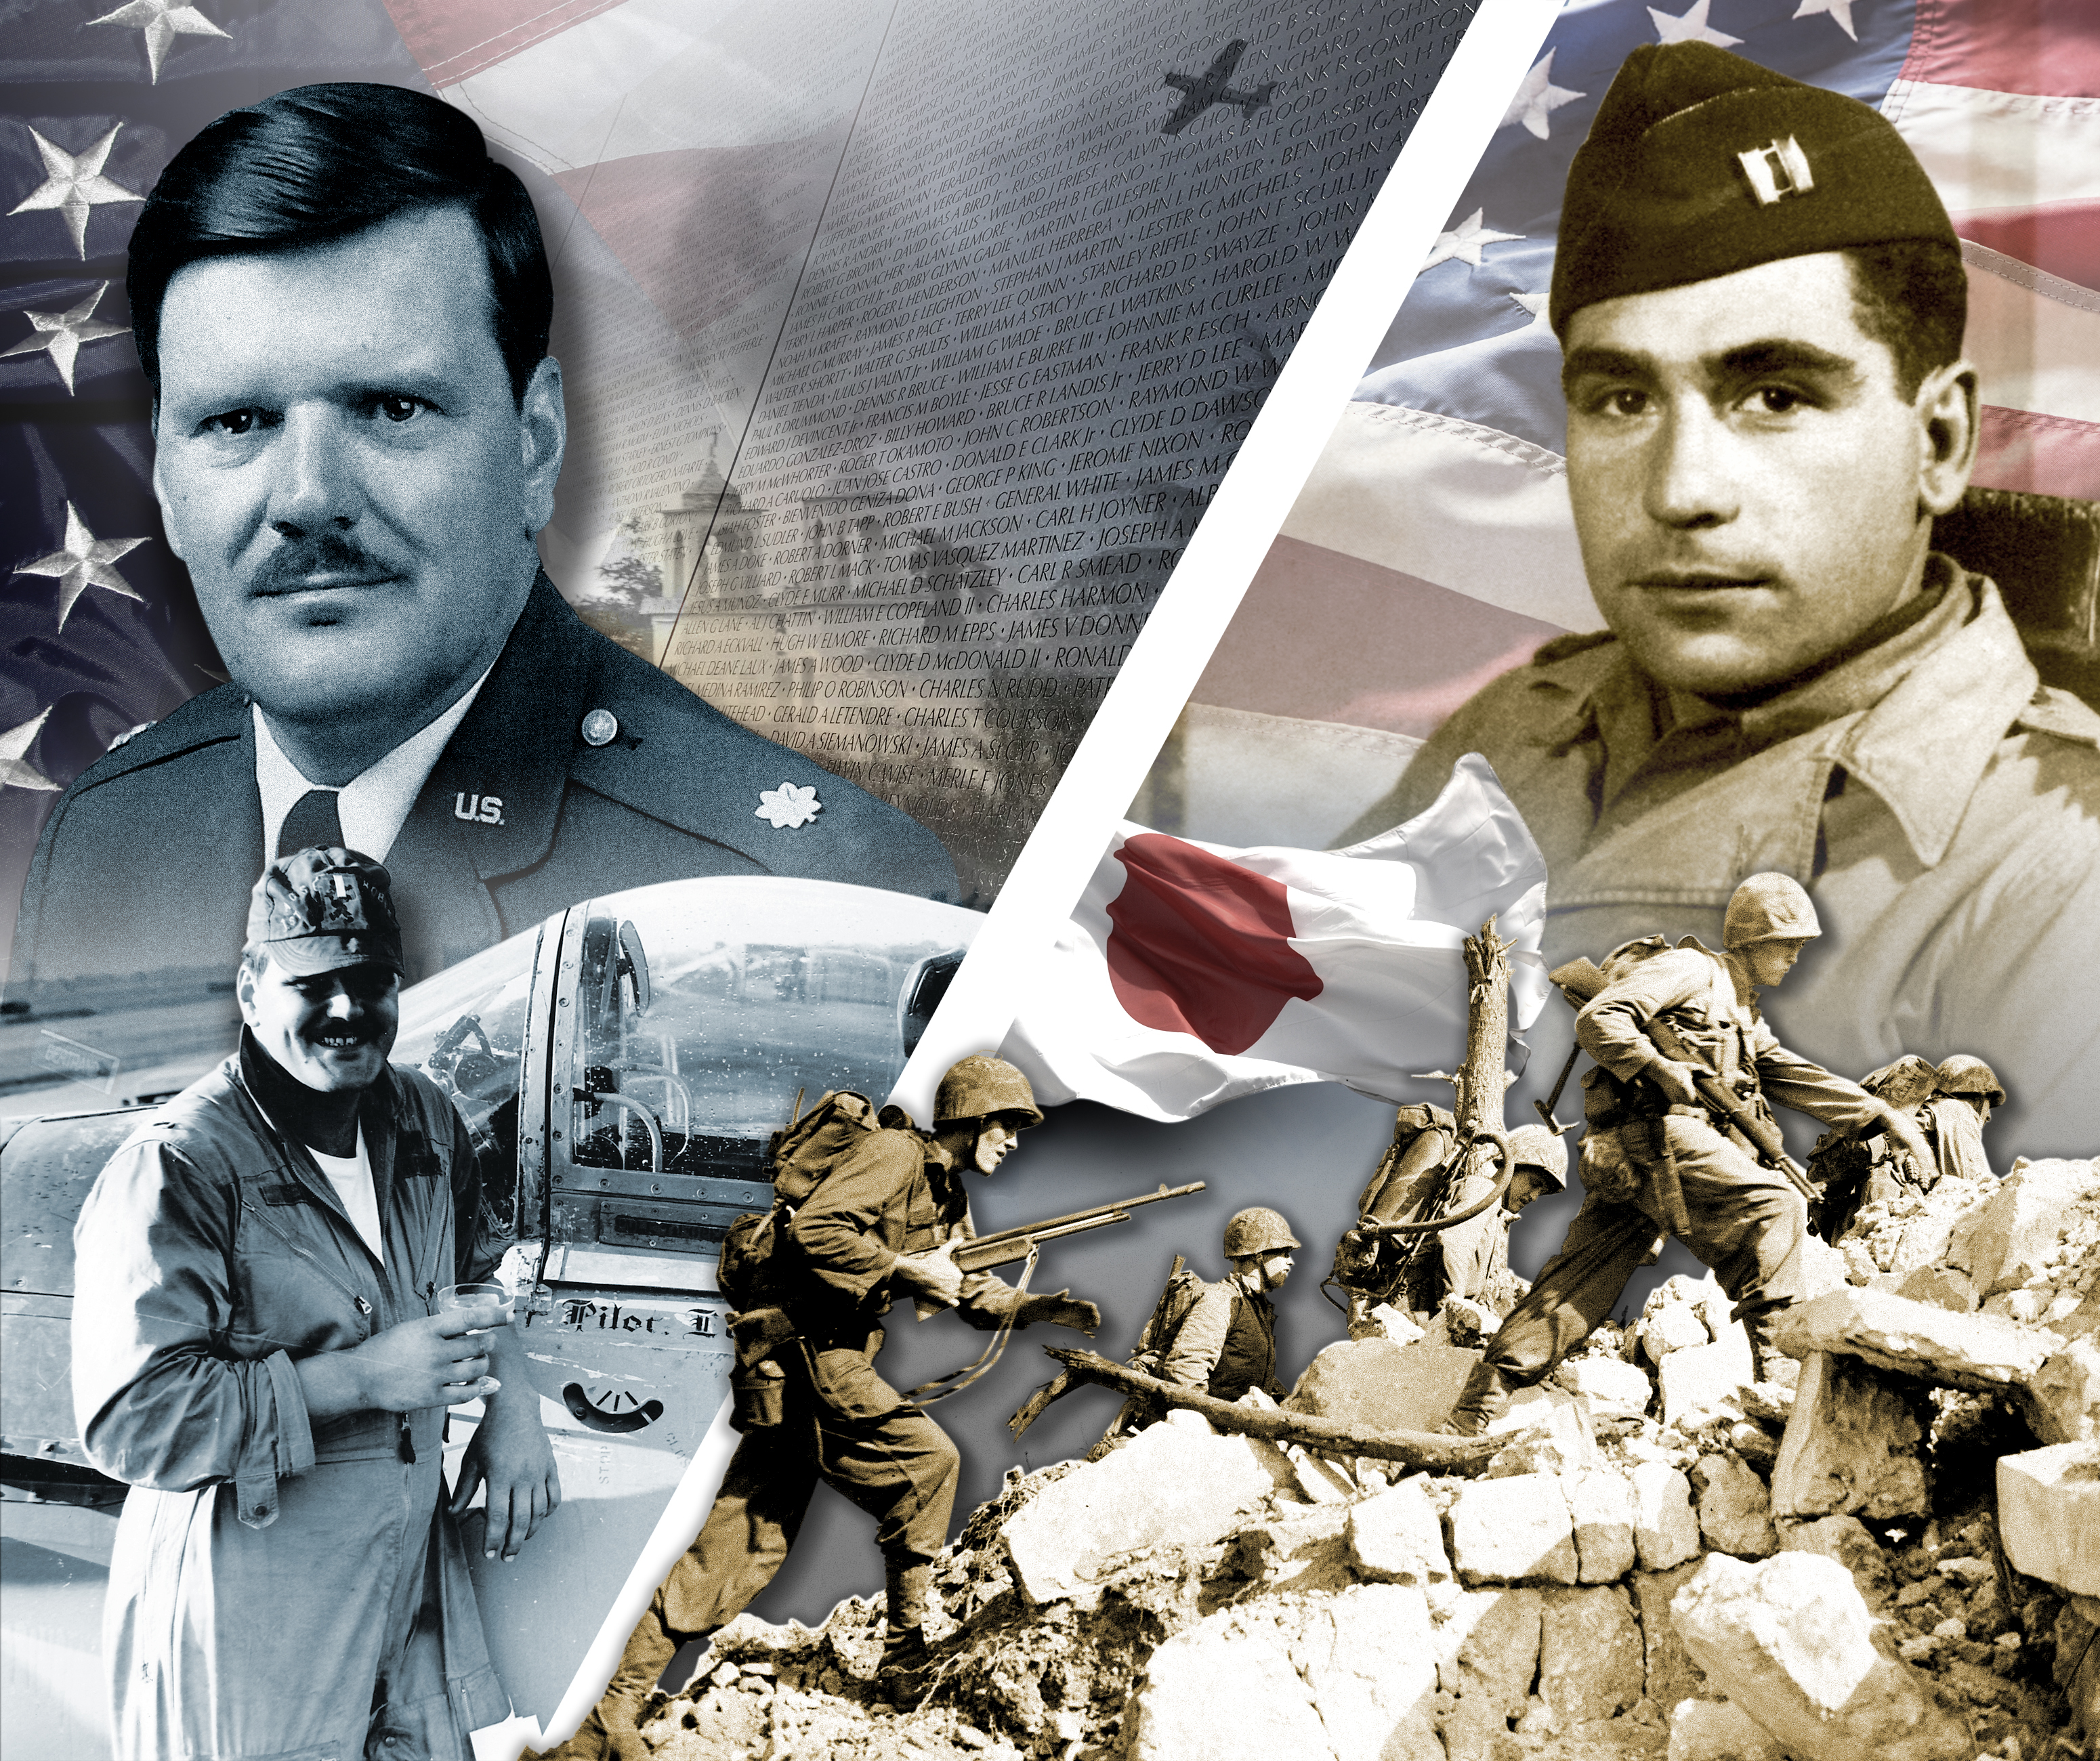 What Memorial Day was like 75 years ago as World War II still raged | Column